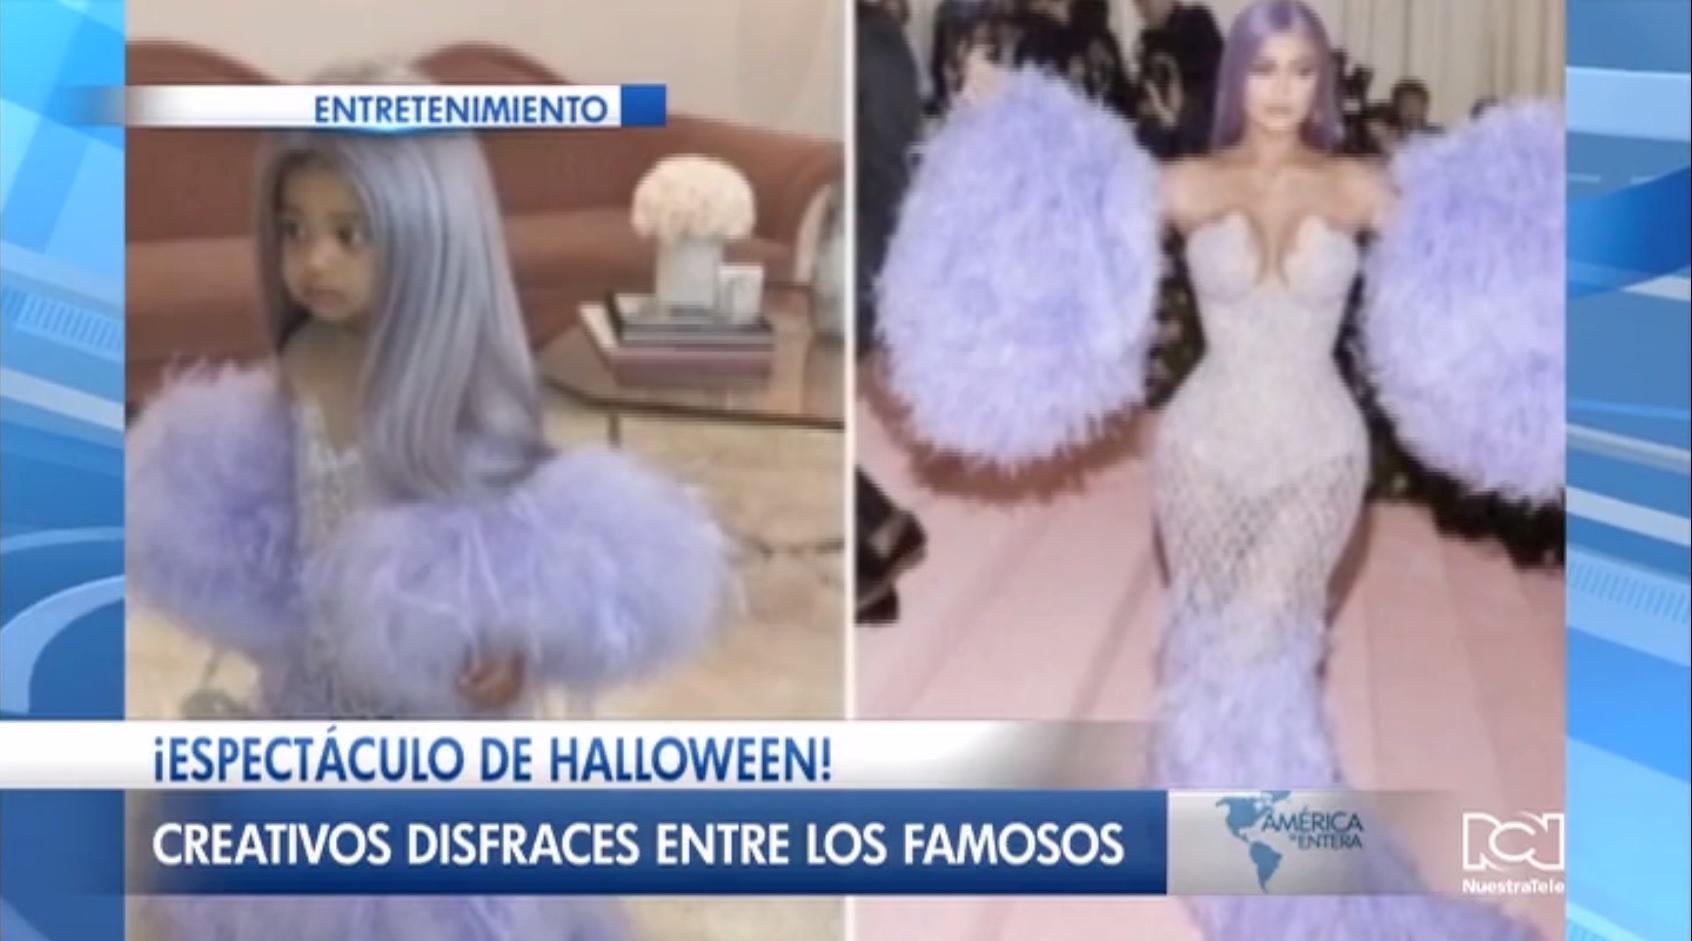 Celebridades de Hollywood presentaron un adelanto de los disfraces que lucirán en Halloween